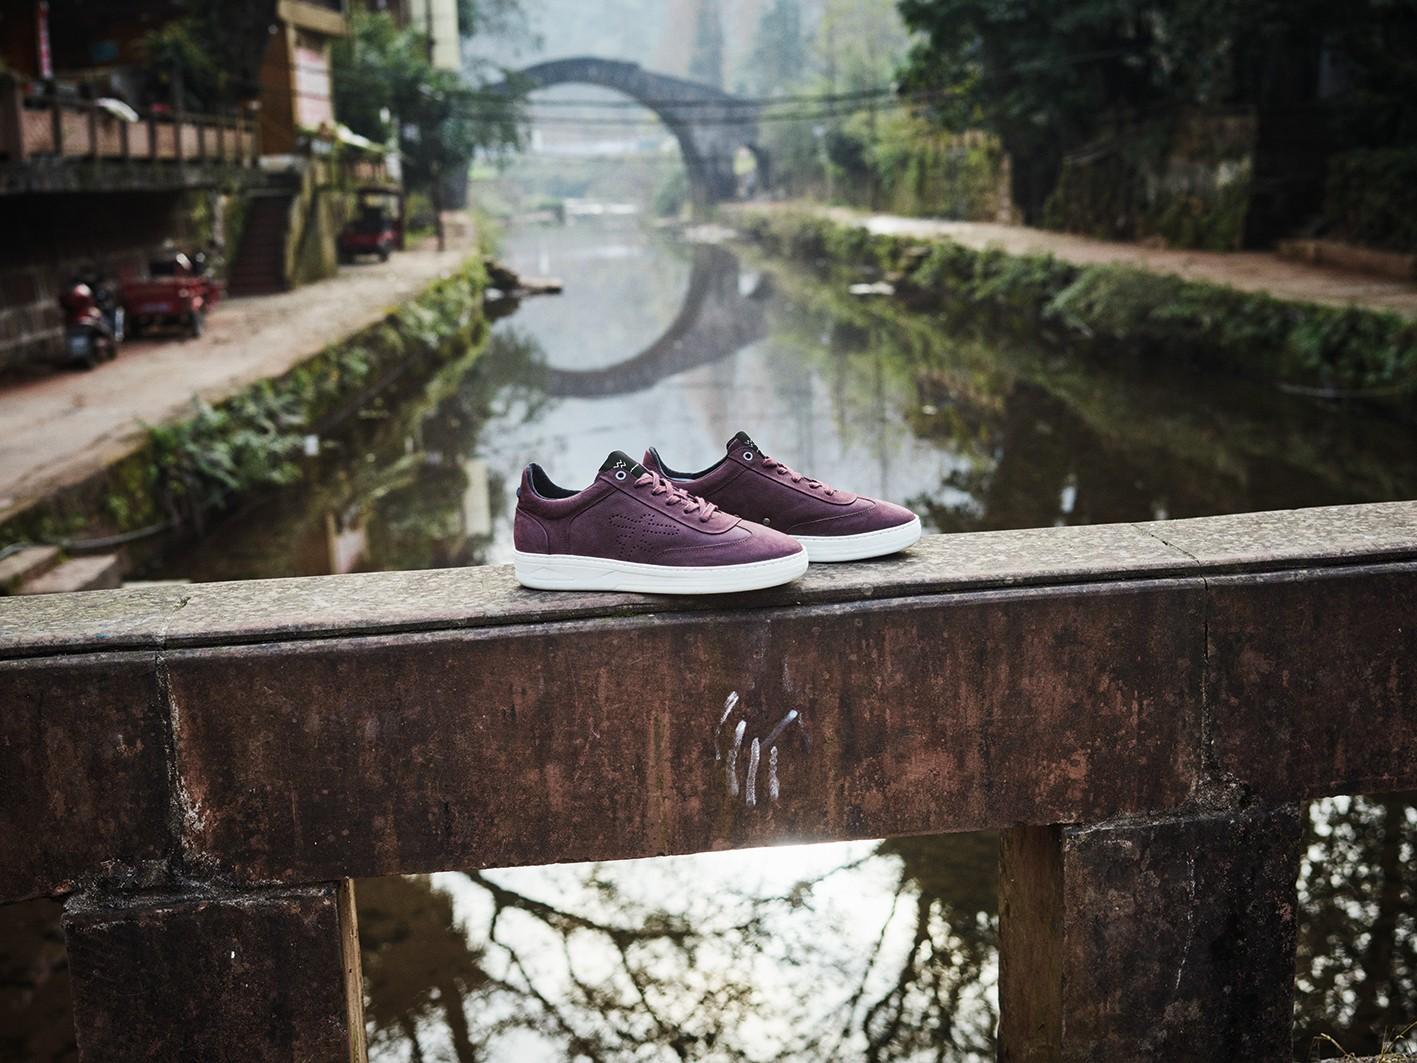 FlorisVanBommel campaign China AW1920 31 - OXMOX verlost Premium-Sneaker von FLORIS VAN BOMMEL